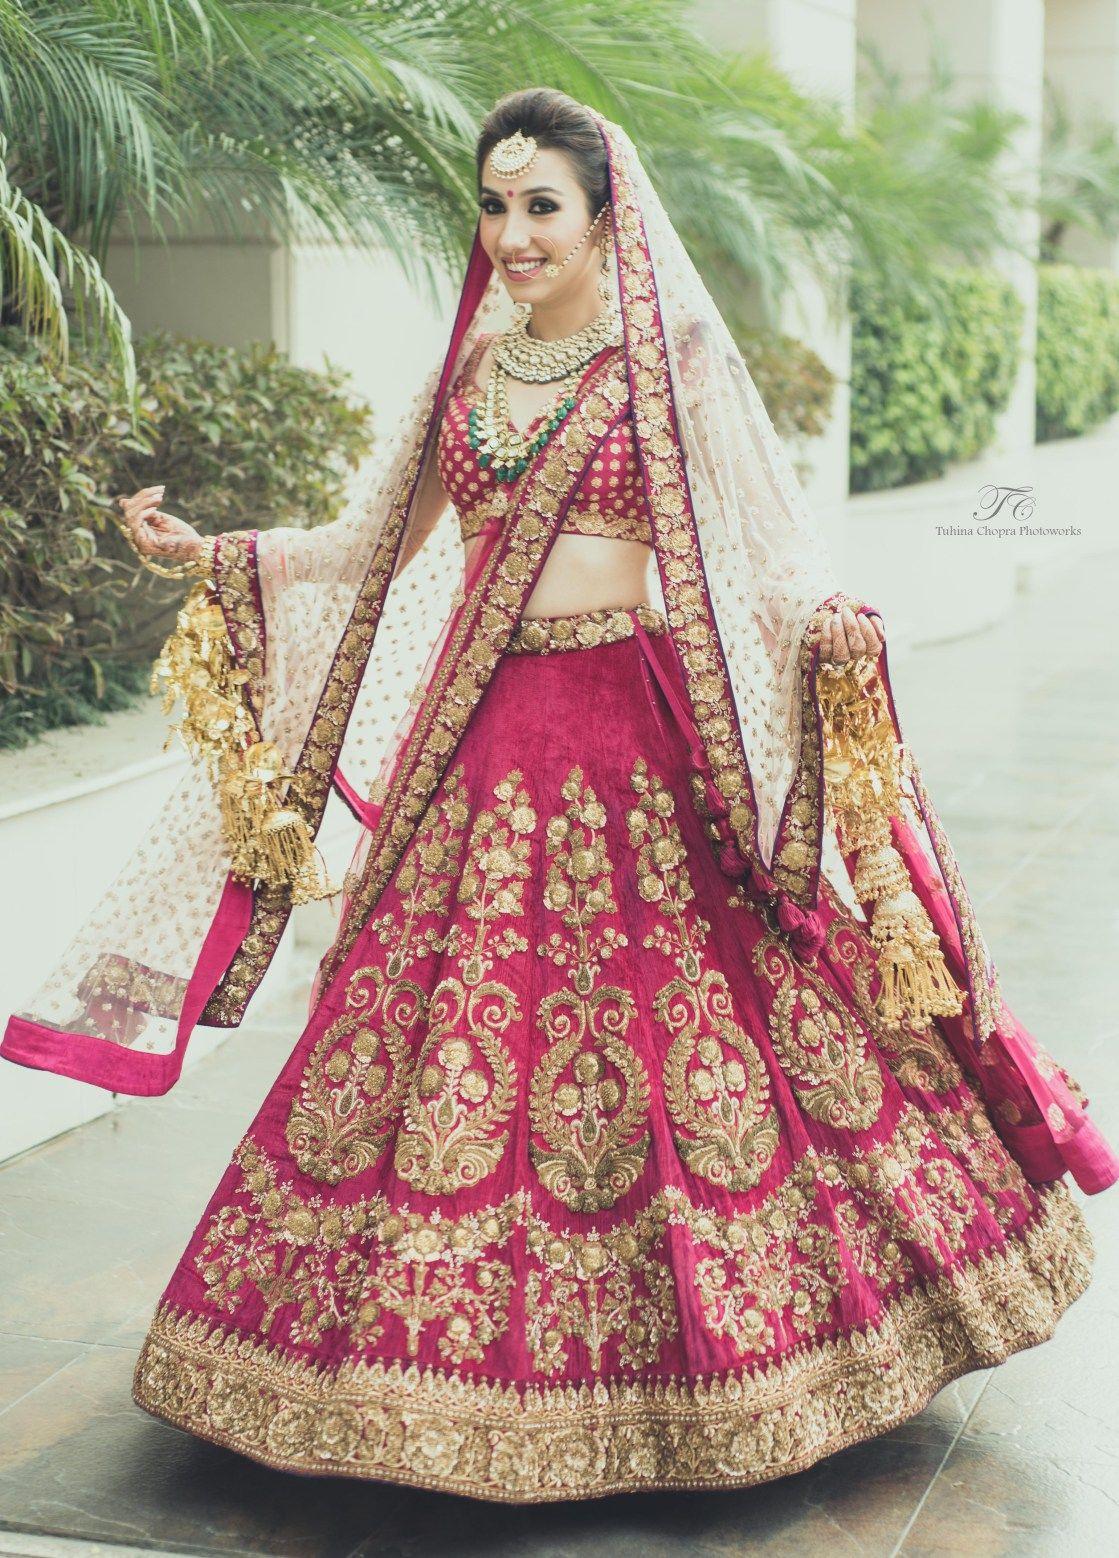 Nikita & Sahil Victorian Inspired Wedding in Delhi